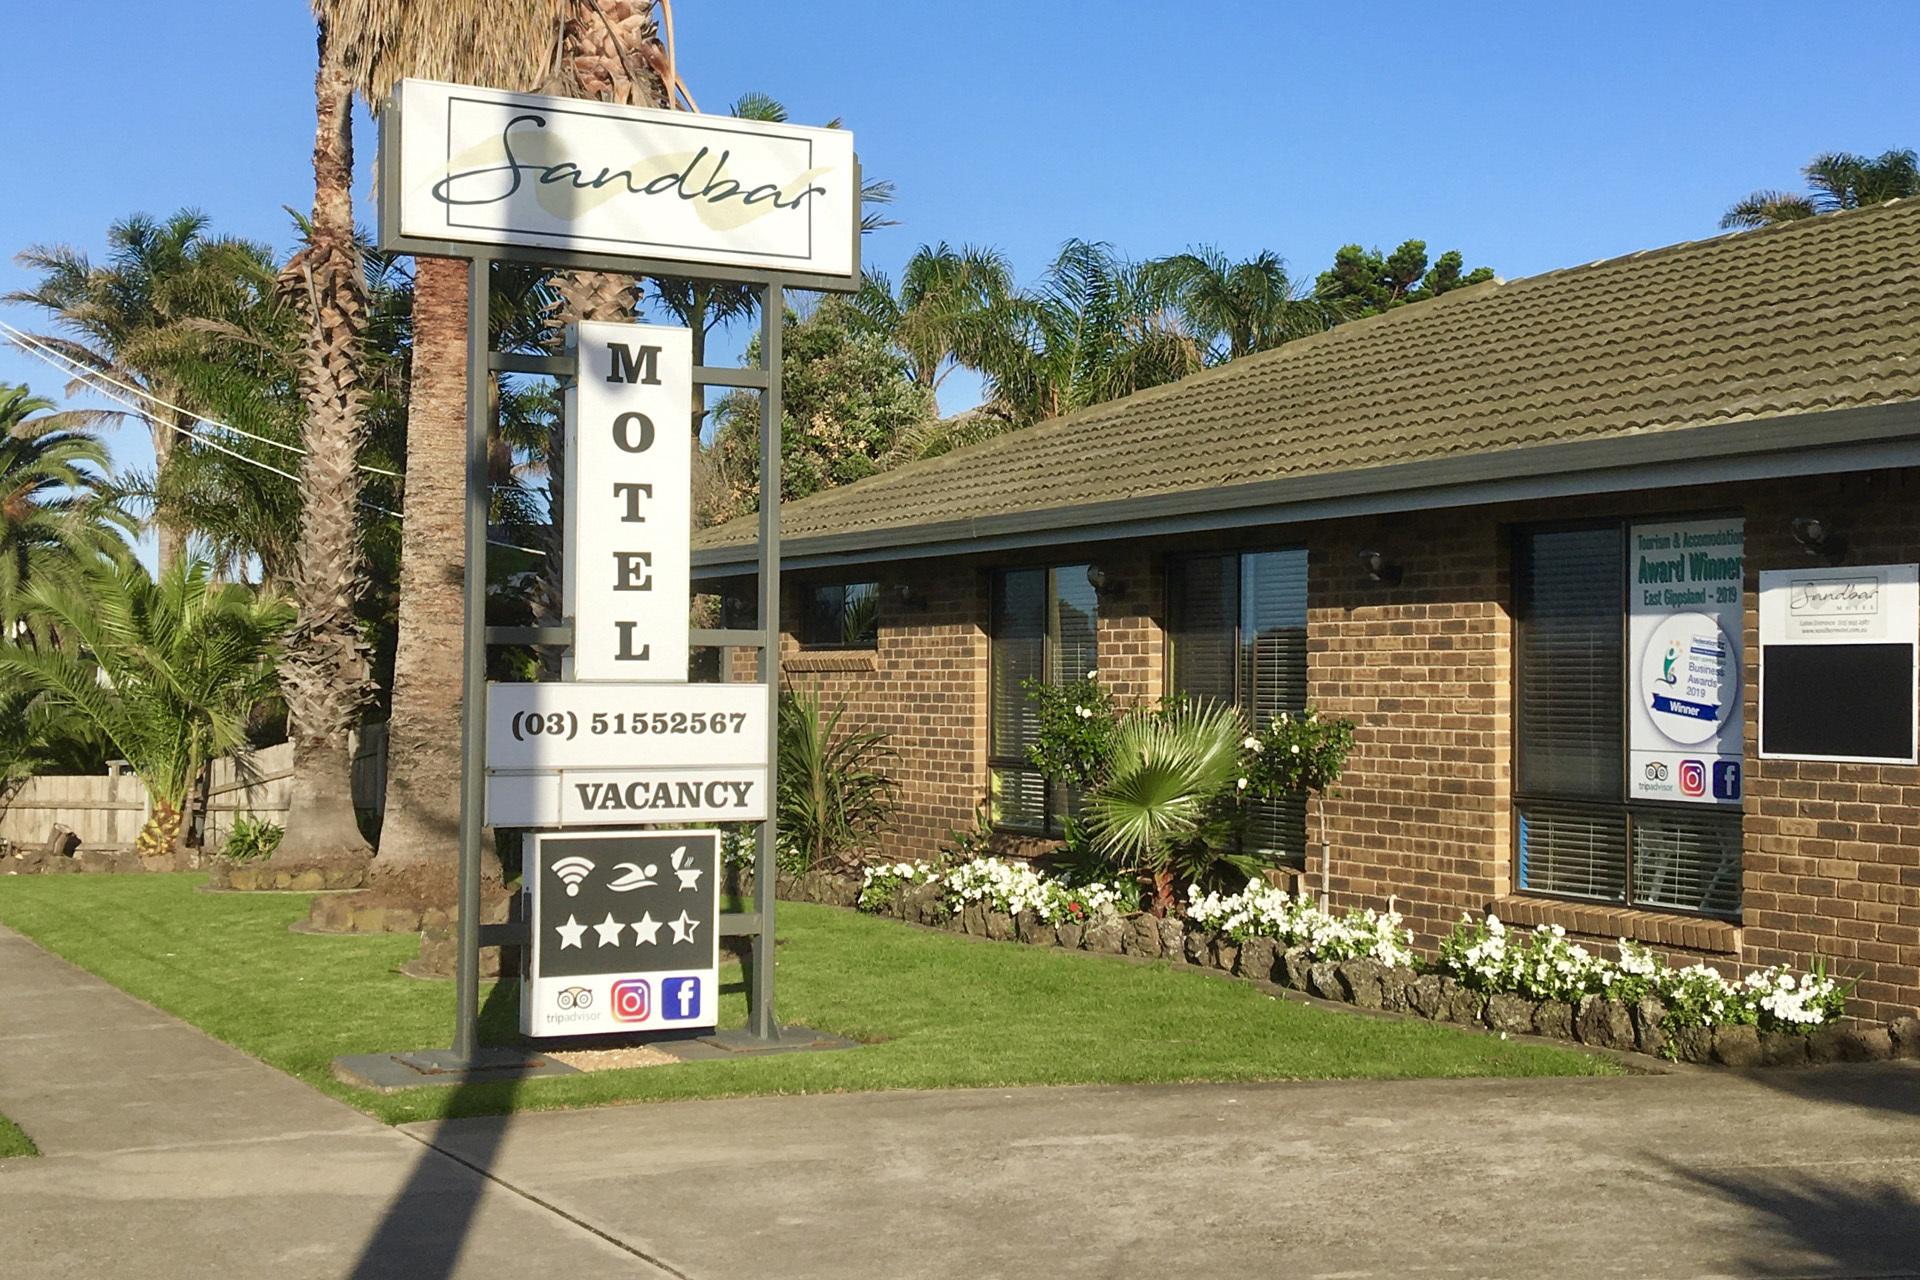 g - Sandbar Motel